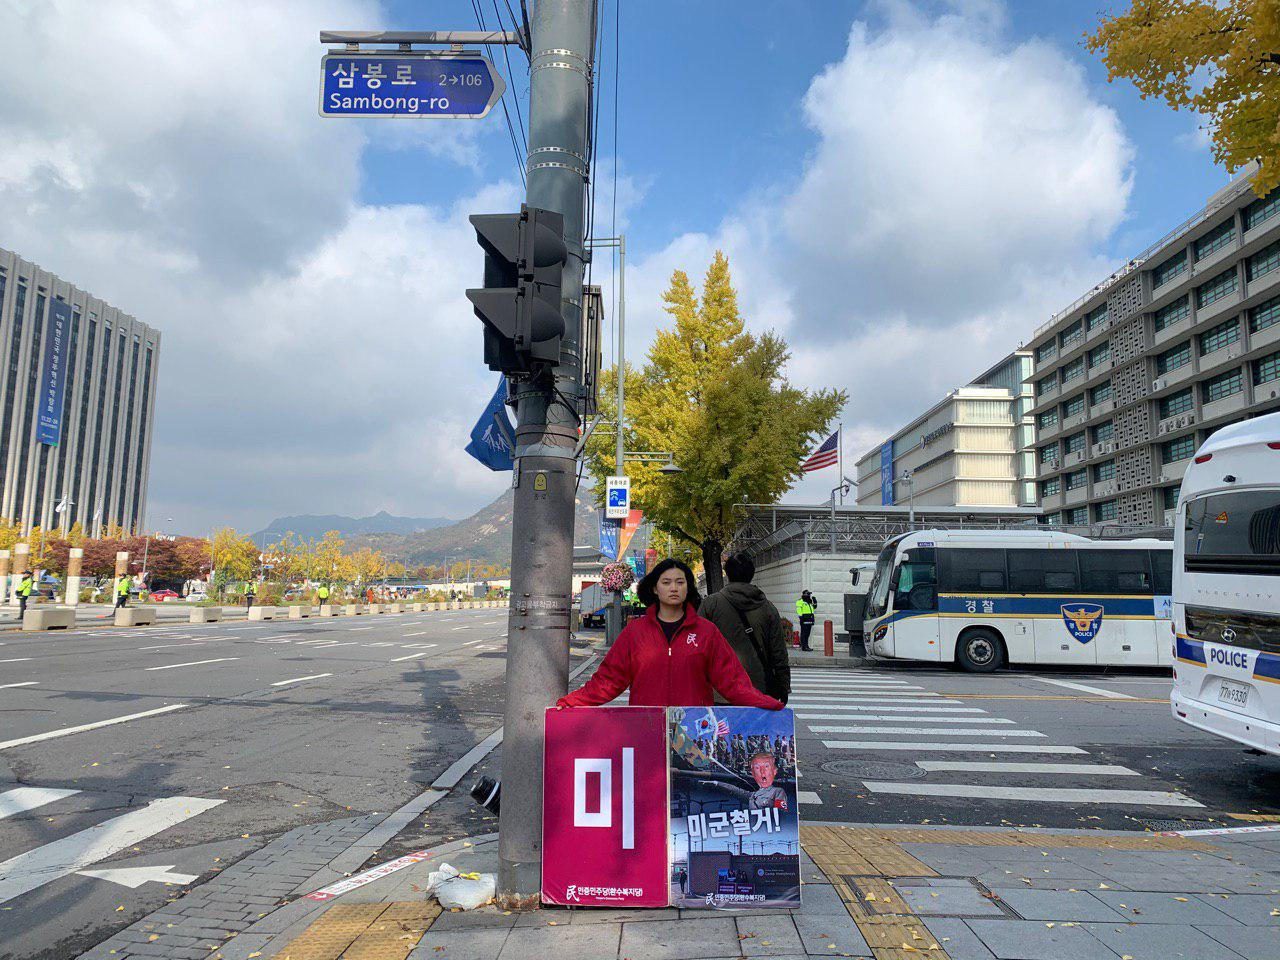 photo_2019-11-11_04-41-10.jpg